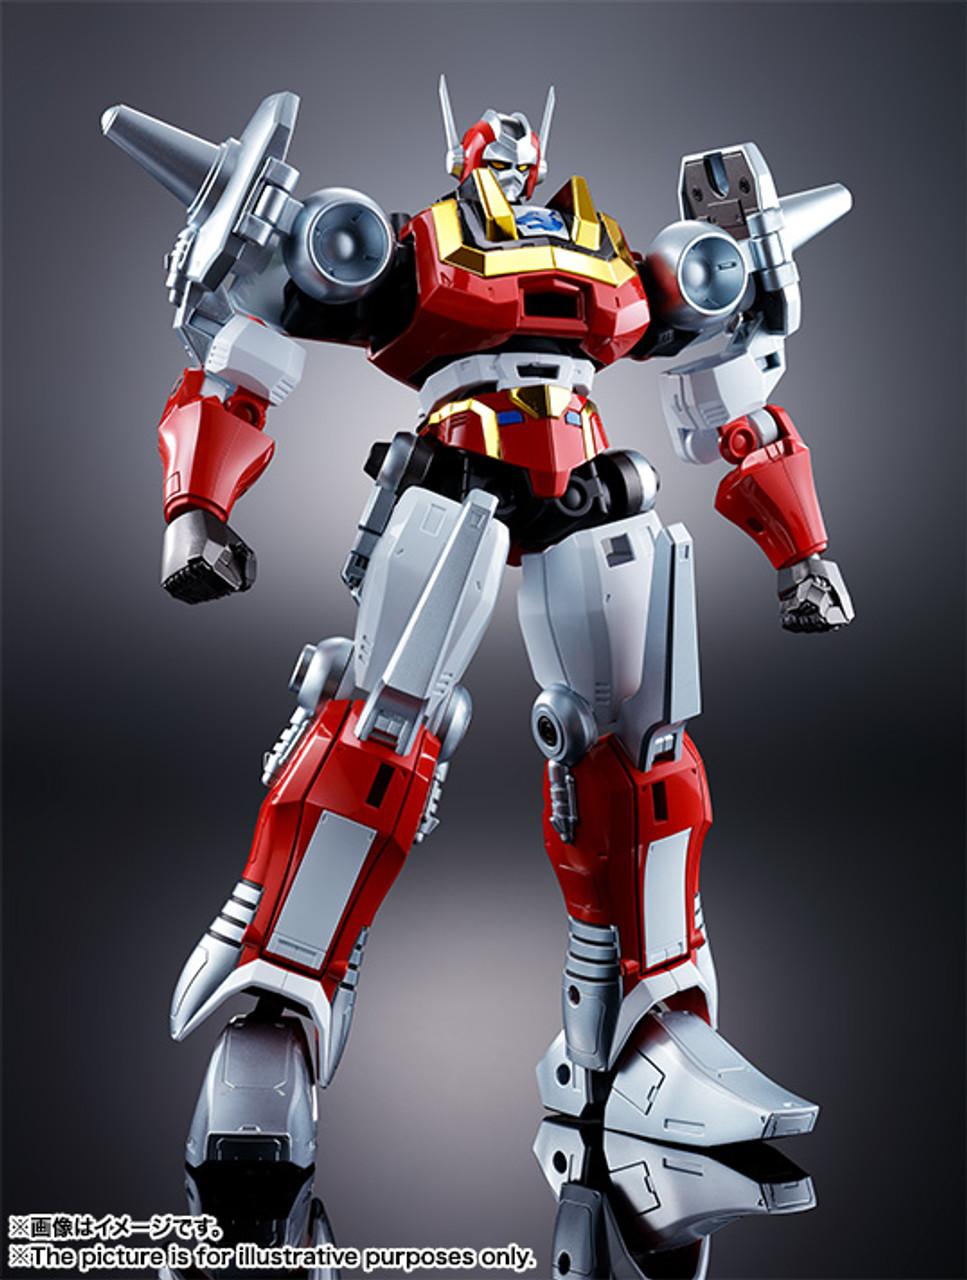 NEW AUTHENTIC ArtStorm Mini Action Figure Chodenji Robo Voltes V RESALE PO